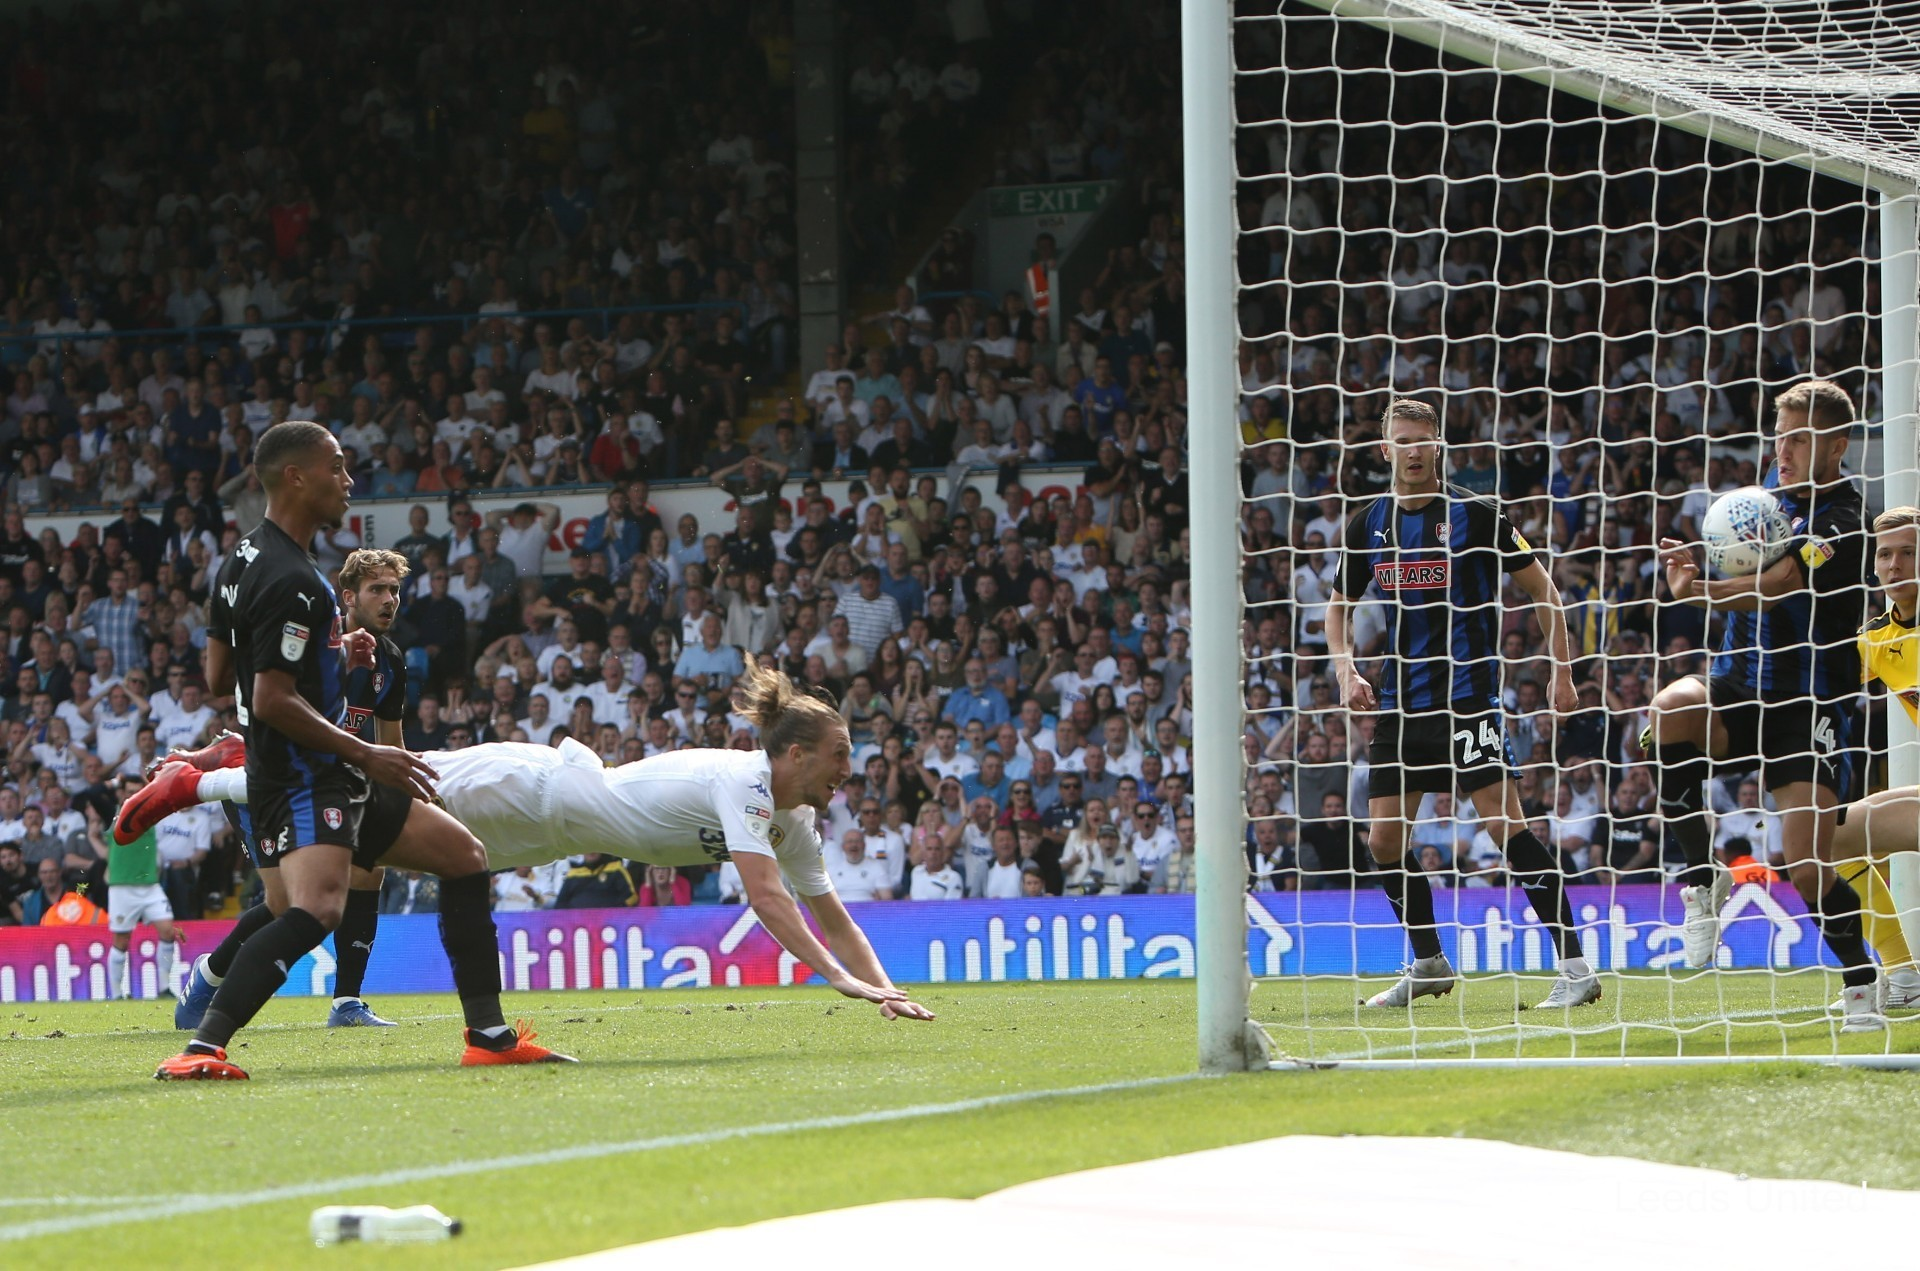 Leeds – Rotherham 2-0